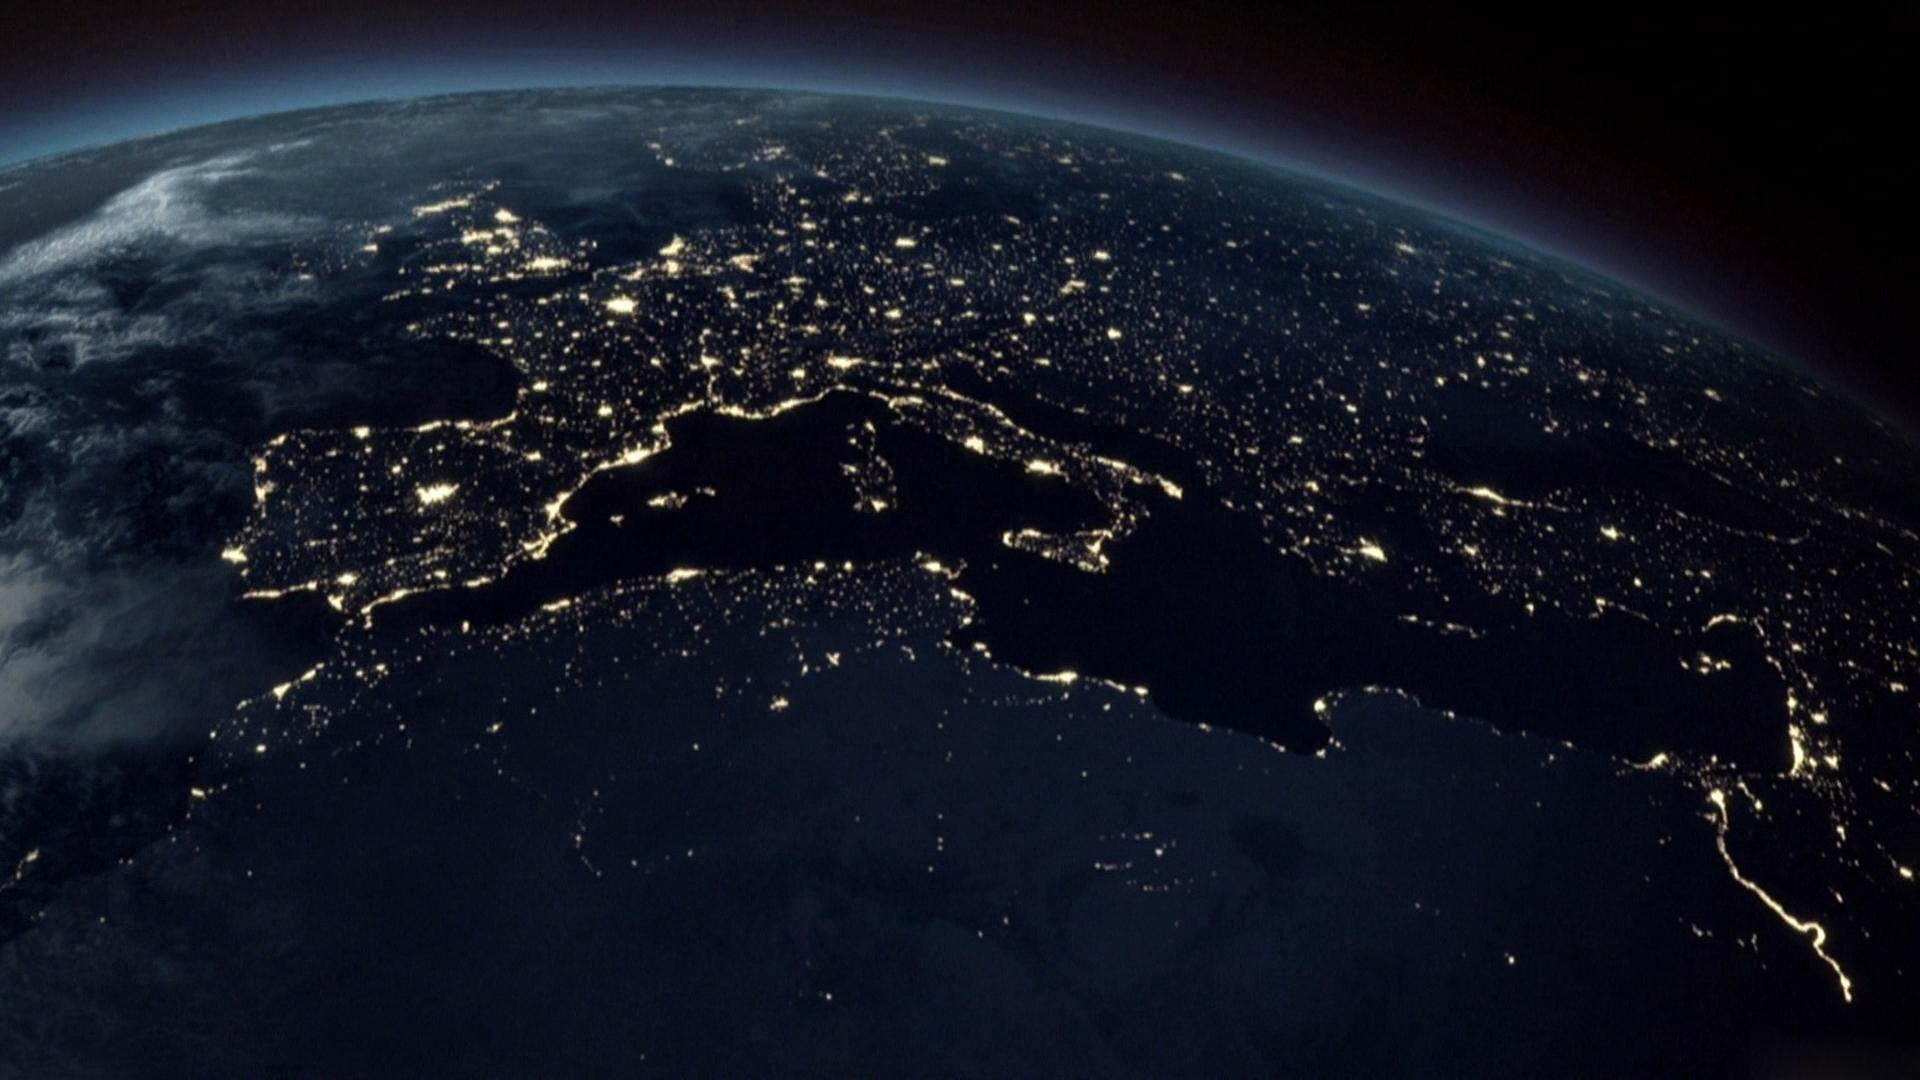 nasa night lights - HD1920×1080